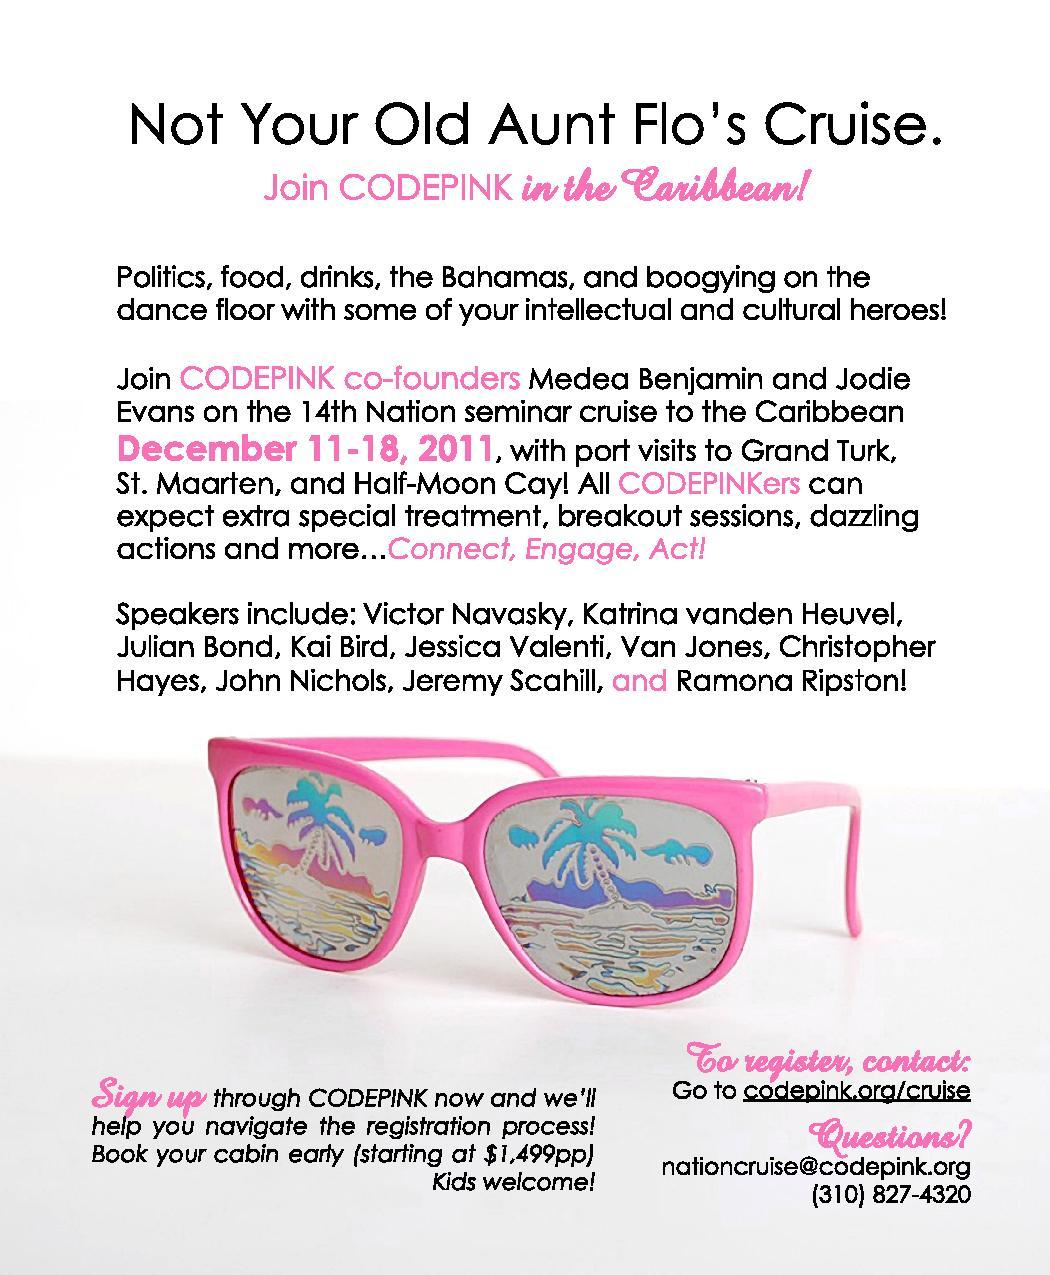 radioshownotes com 11 01 2011 12 01 2011 code pink caribbean cruise